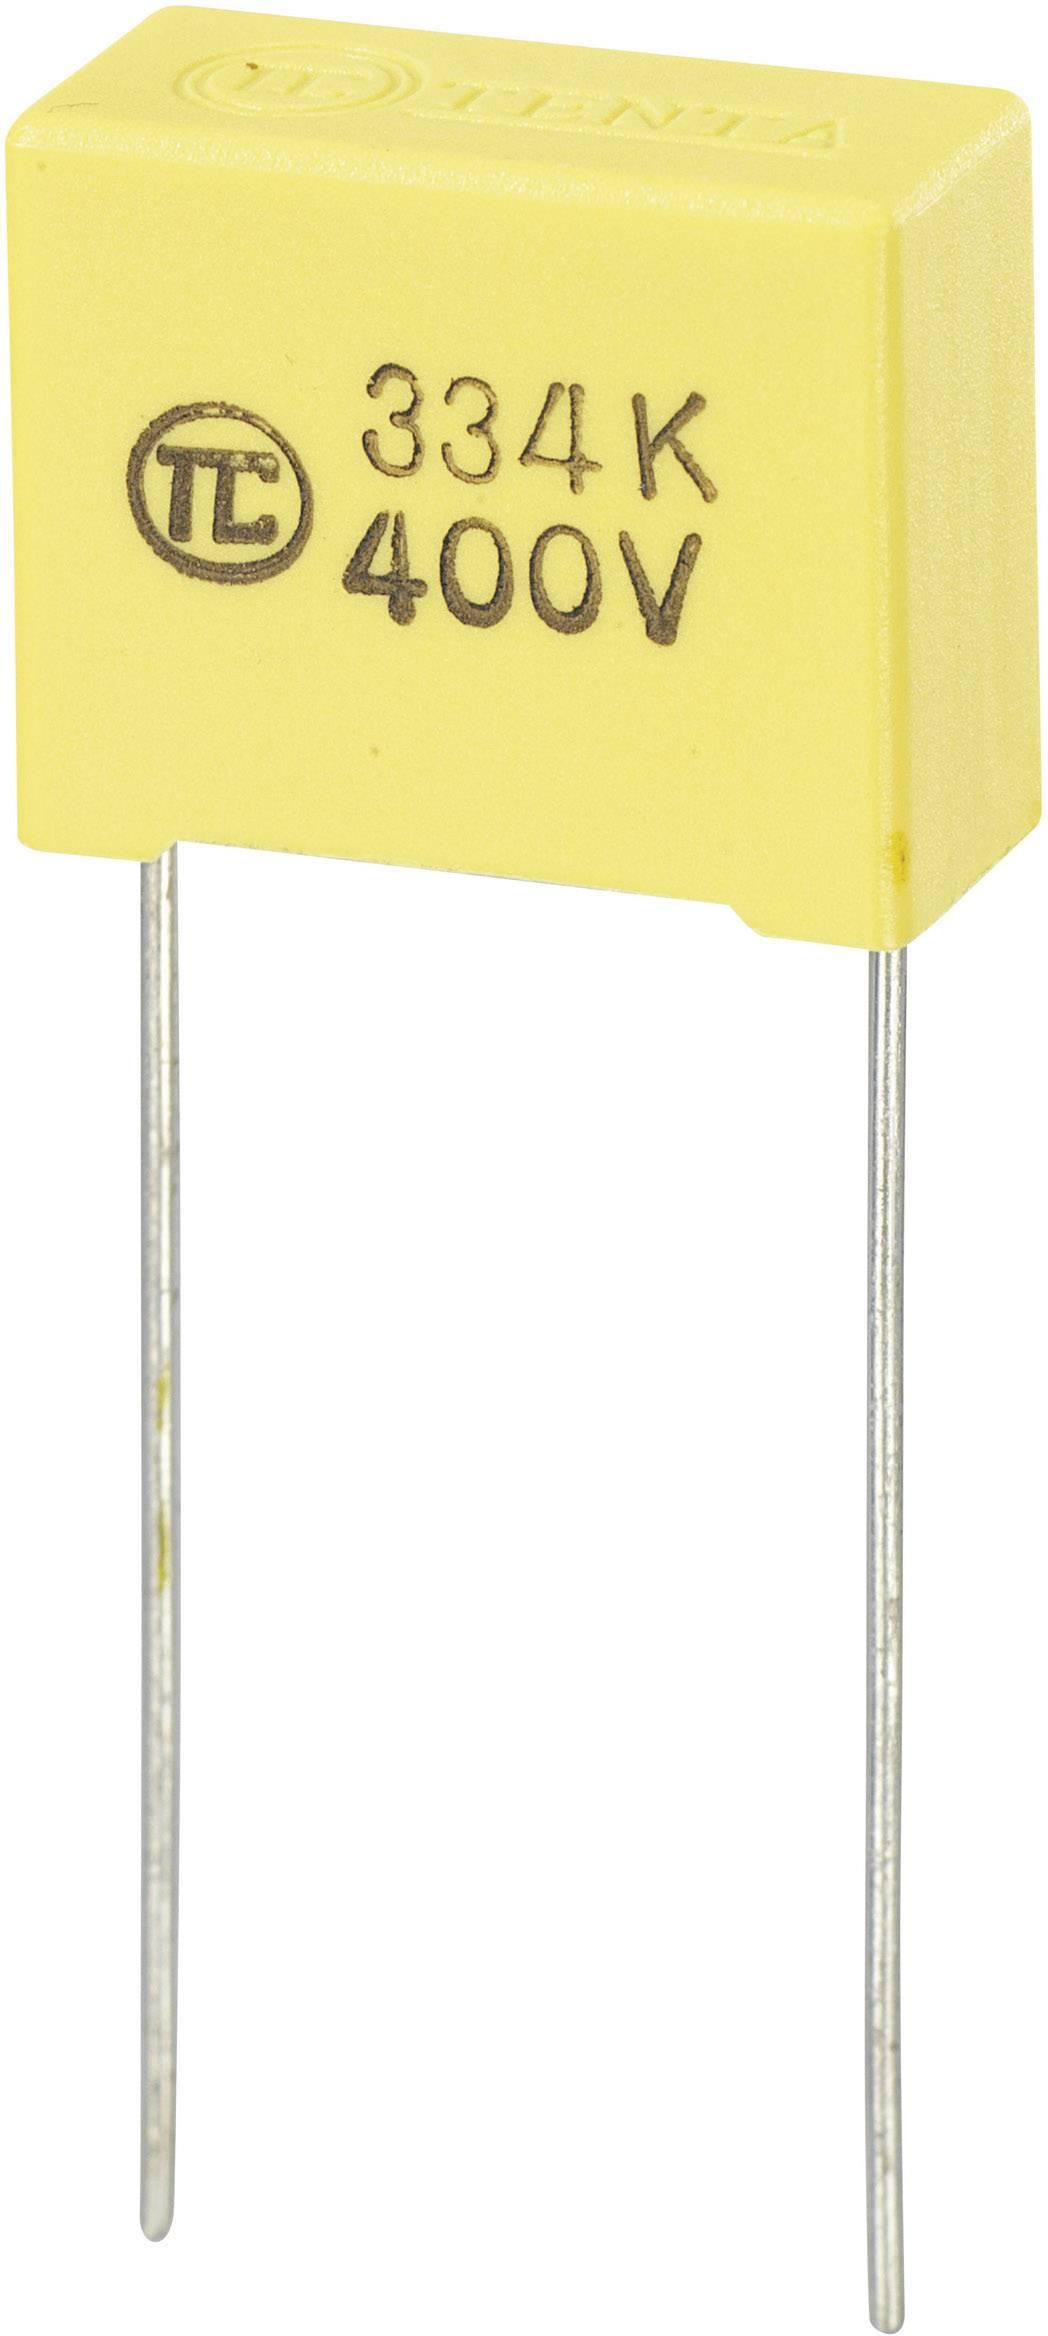 Foliový kondenzátor MKS, 0,33 µF, 400 V, 5 %, 18 x 8,5 x 14,5 mm